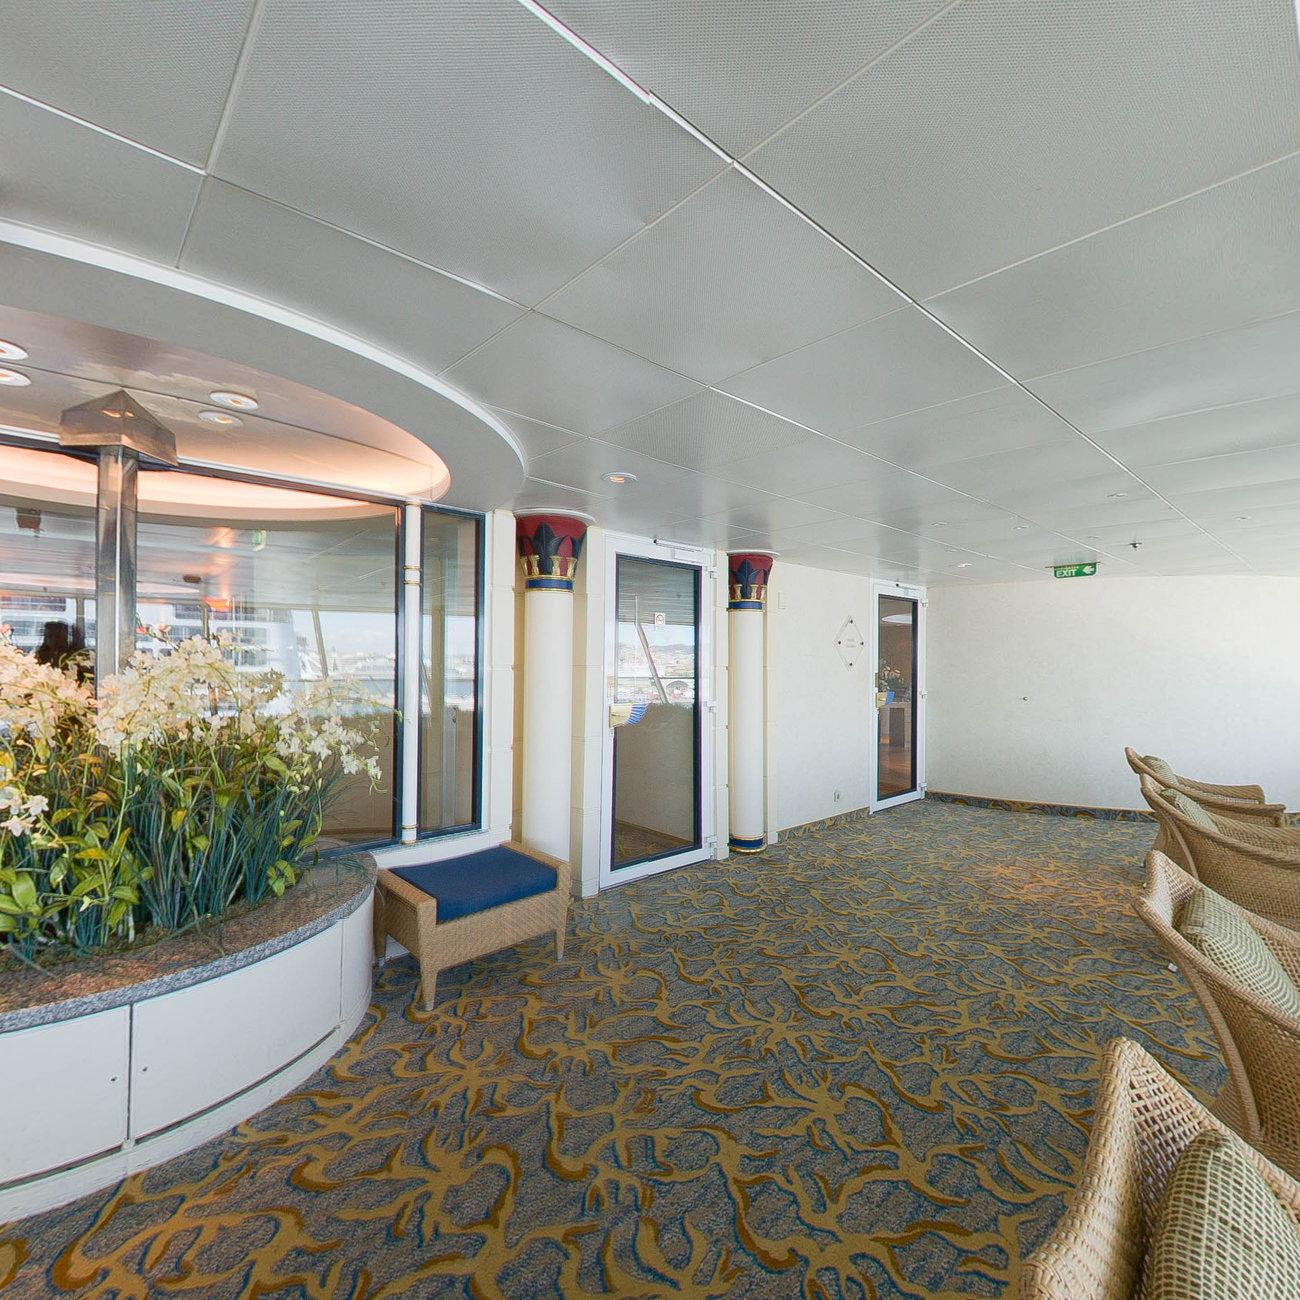 Salon Panorama Officiel: Spa On Royal Caribbean Rhapsody Of The Seas Cruise Ship